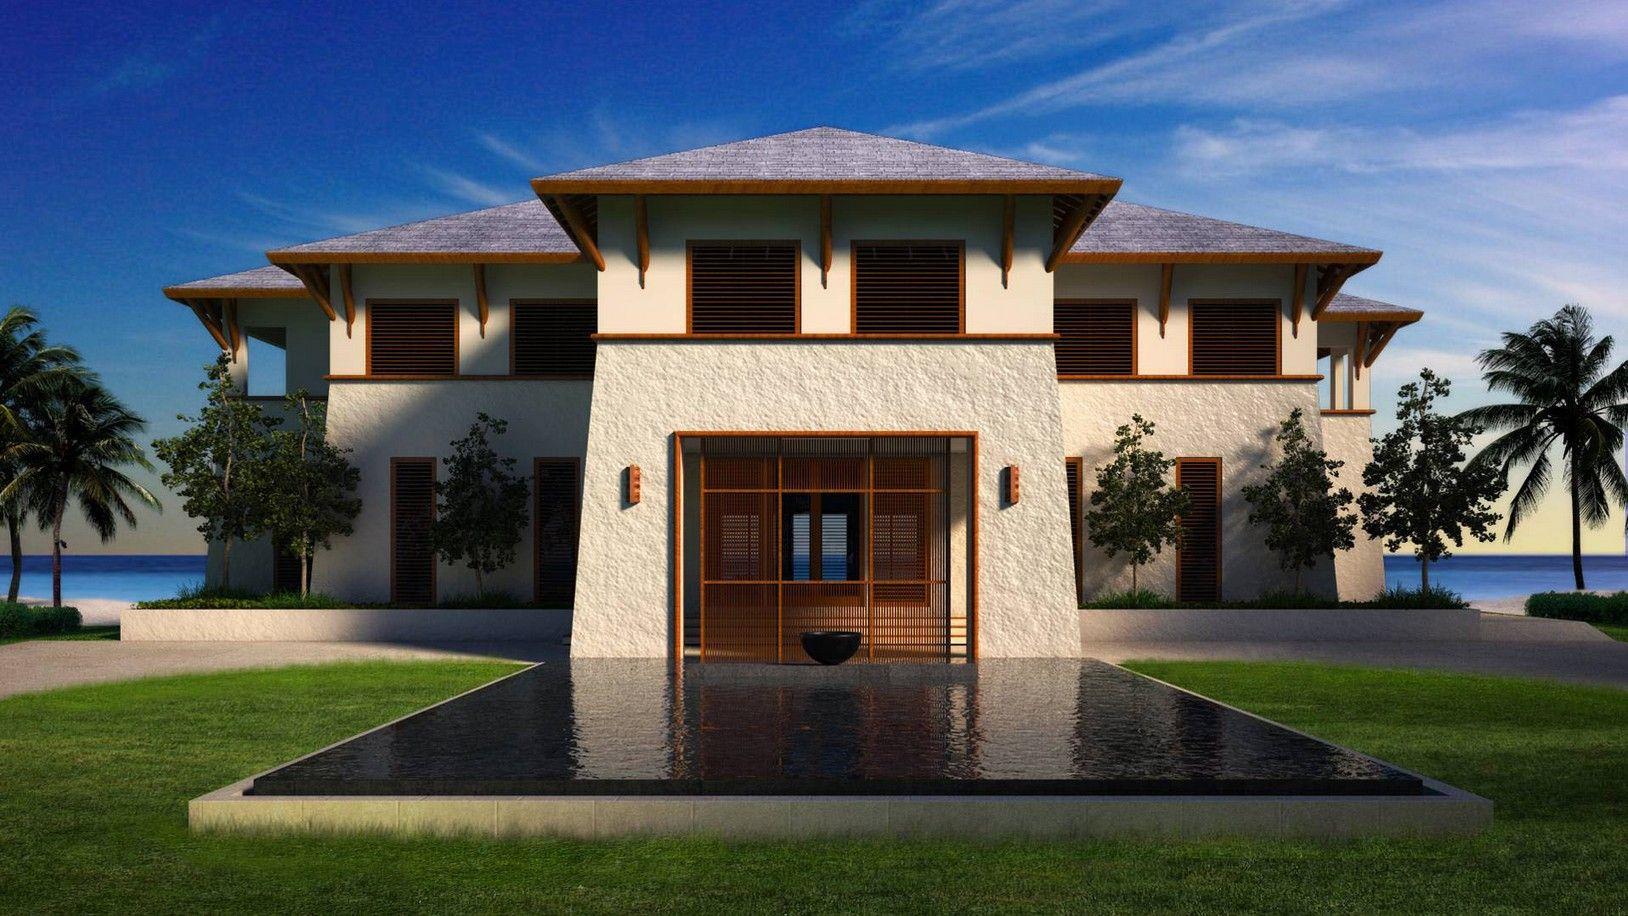 Luxury Homes Luxury Bahamas Homes 1024x576 Bahamas Luxury Homes European Style Homes Fancy Houses Luxury Homes